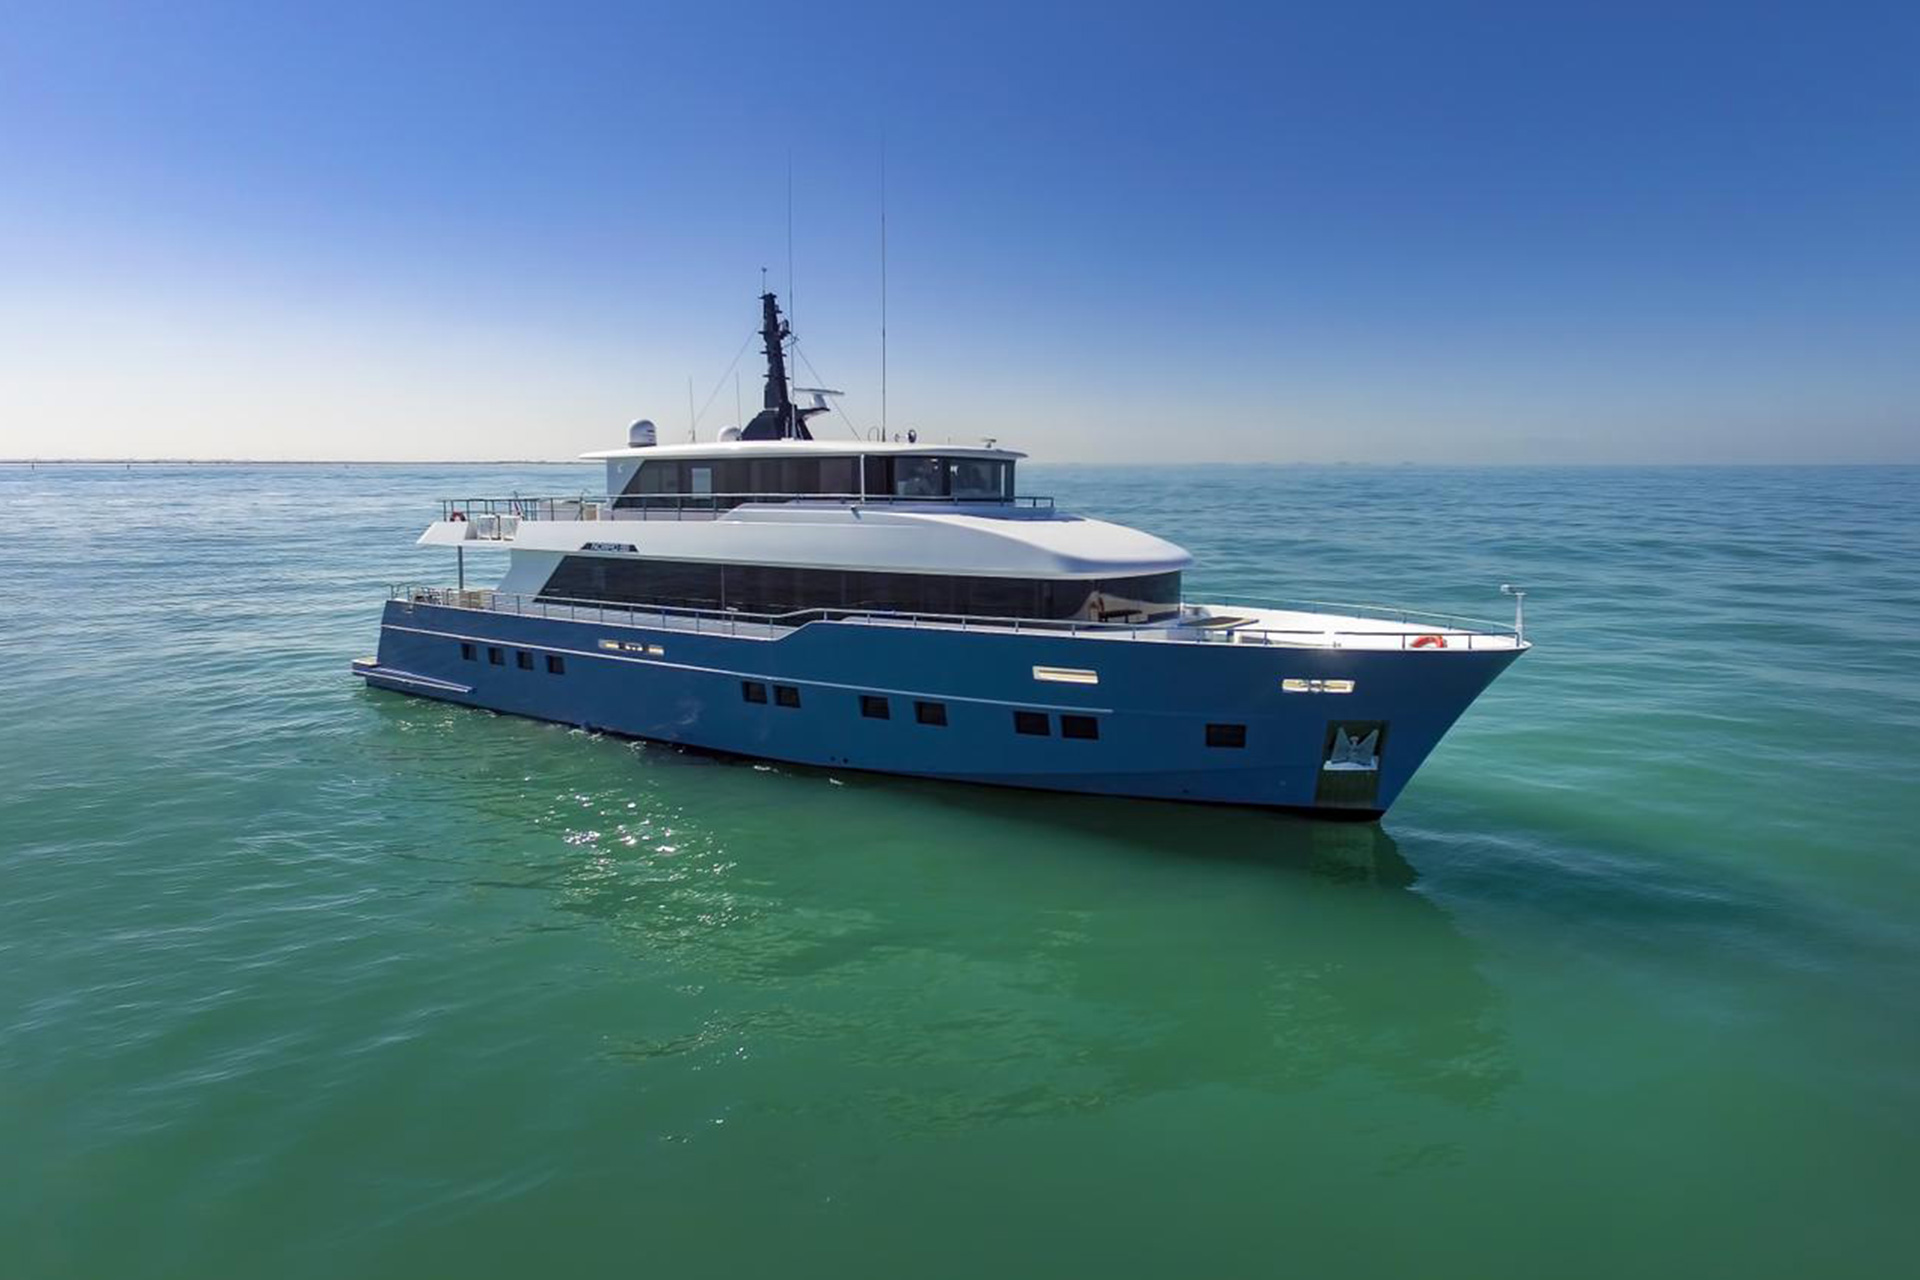 Nomad 95 SUV - Nomad Yachts by - Drettmann Yachts